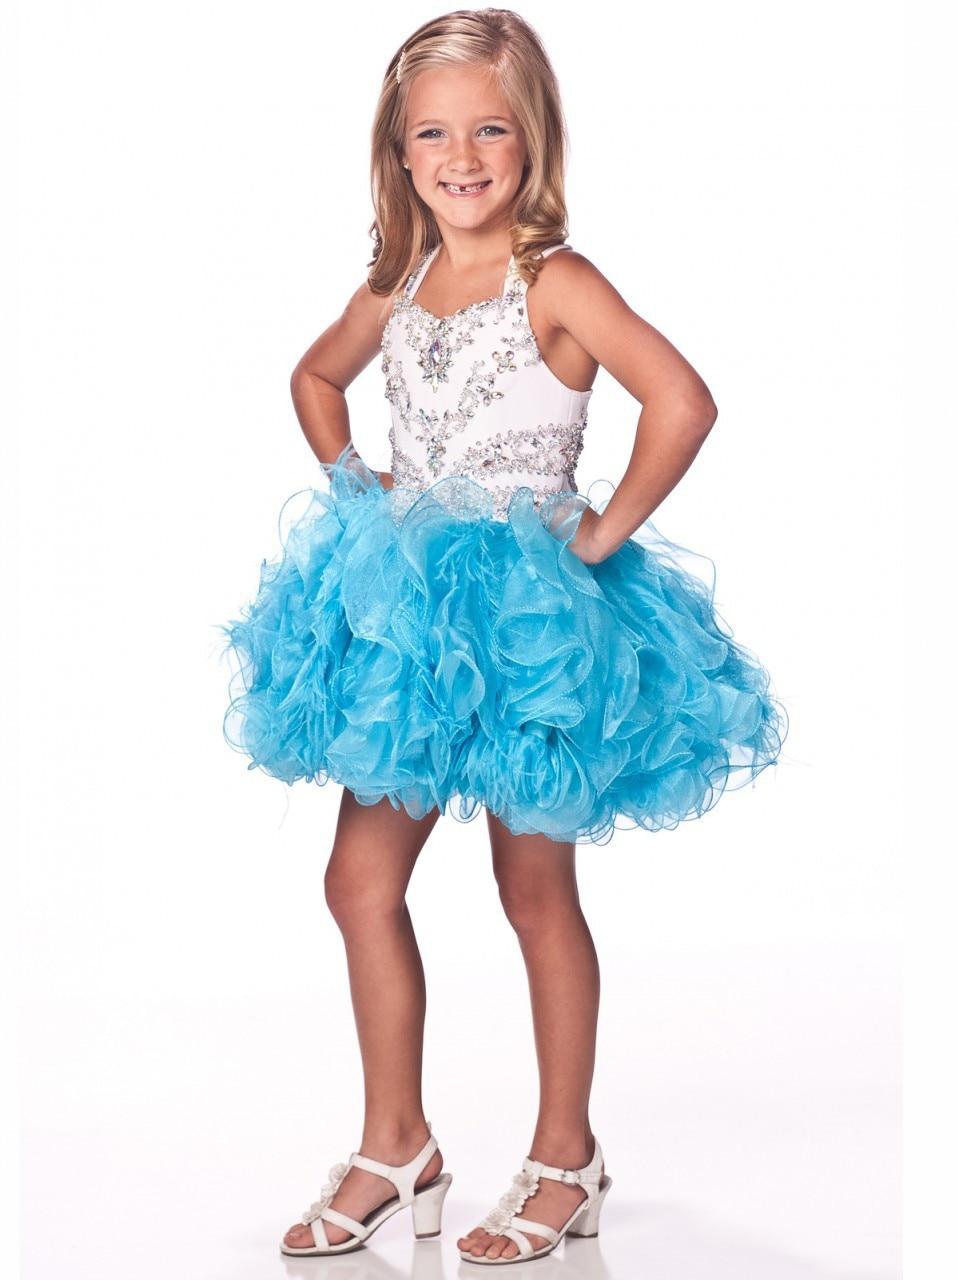 Aliexpress.com : Buy cupcake glitz girls short pageant dresses ...